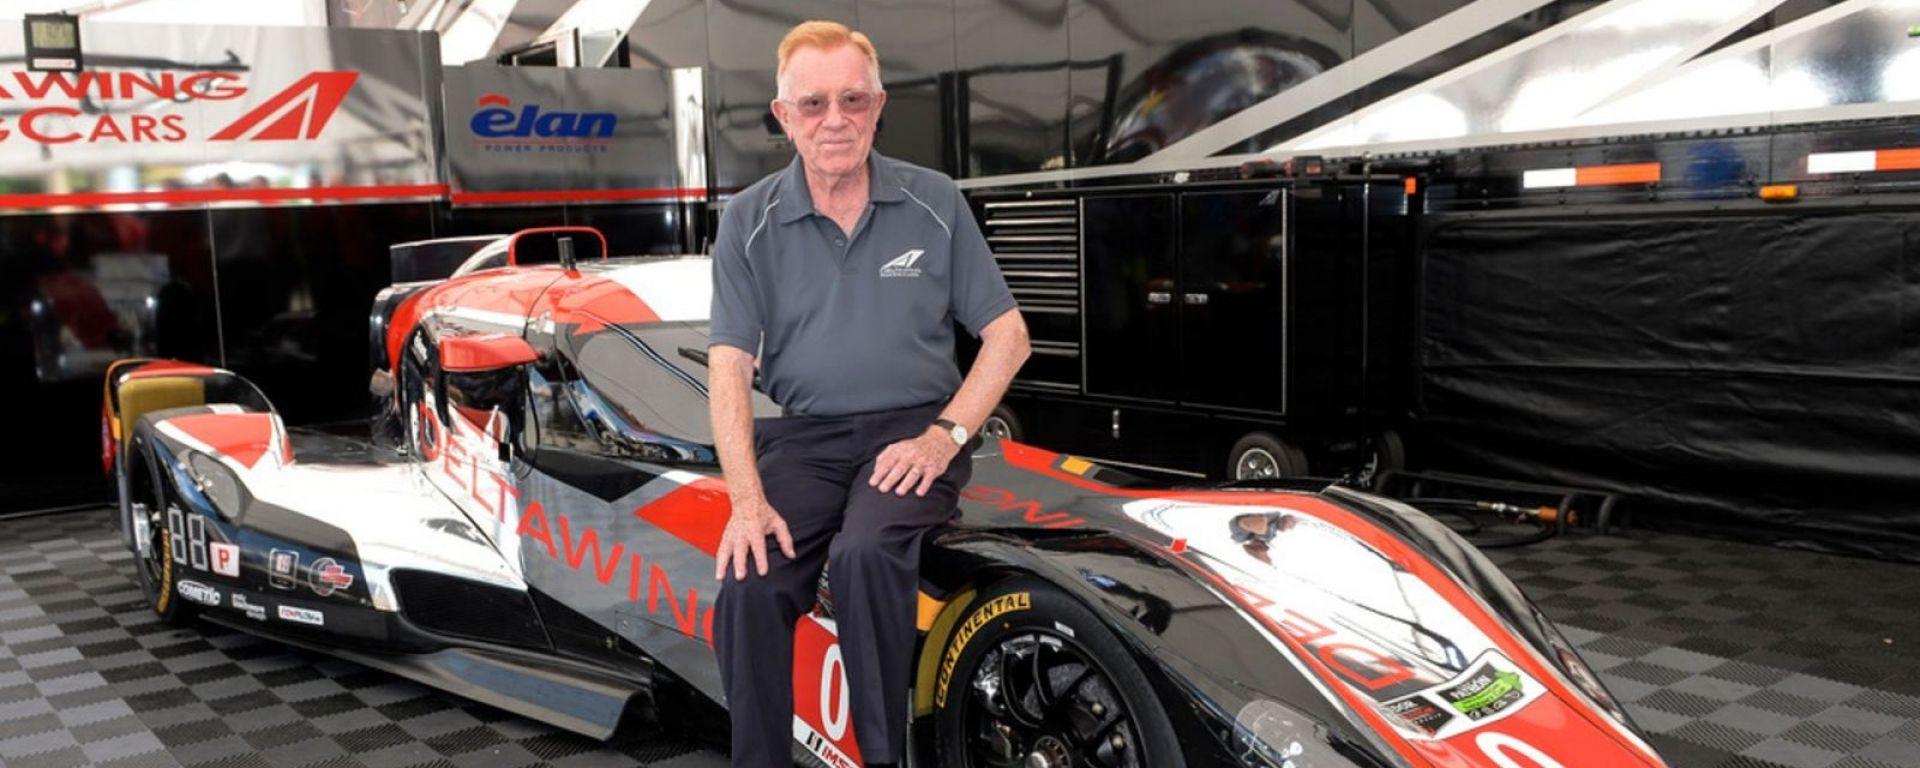 Il mondo del Motorsport saluta Don Panoz